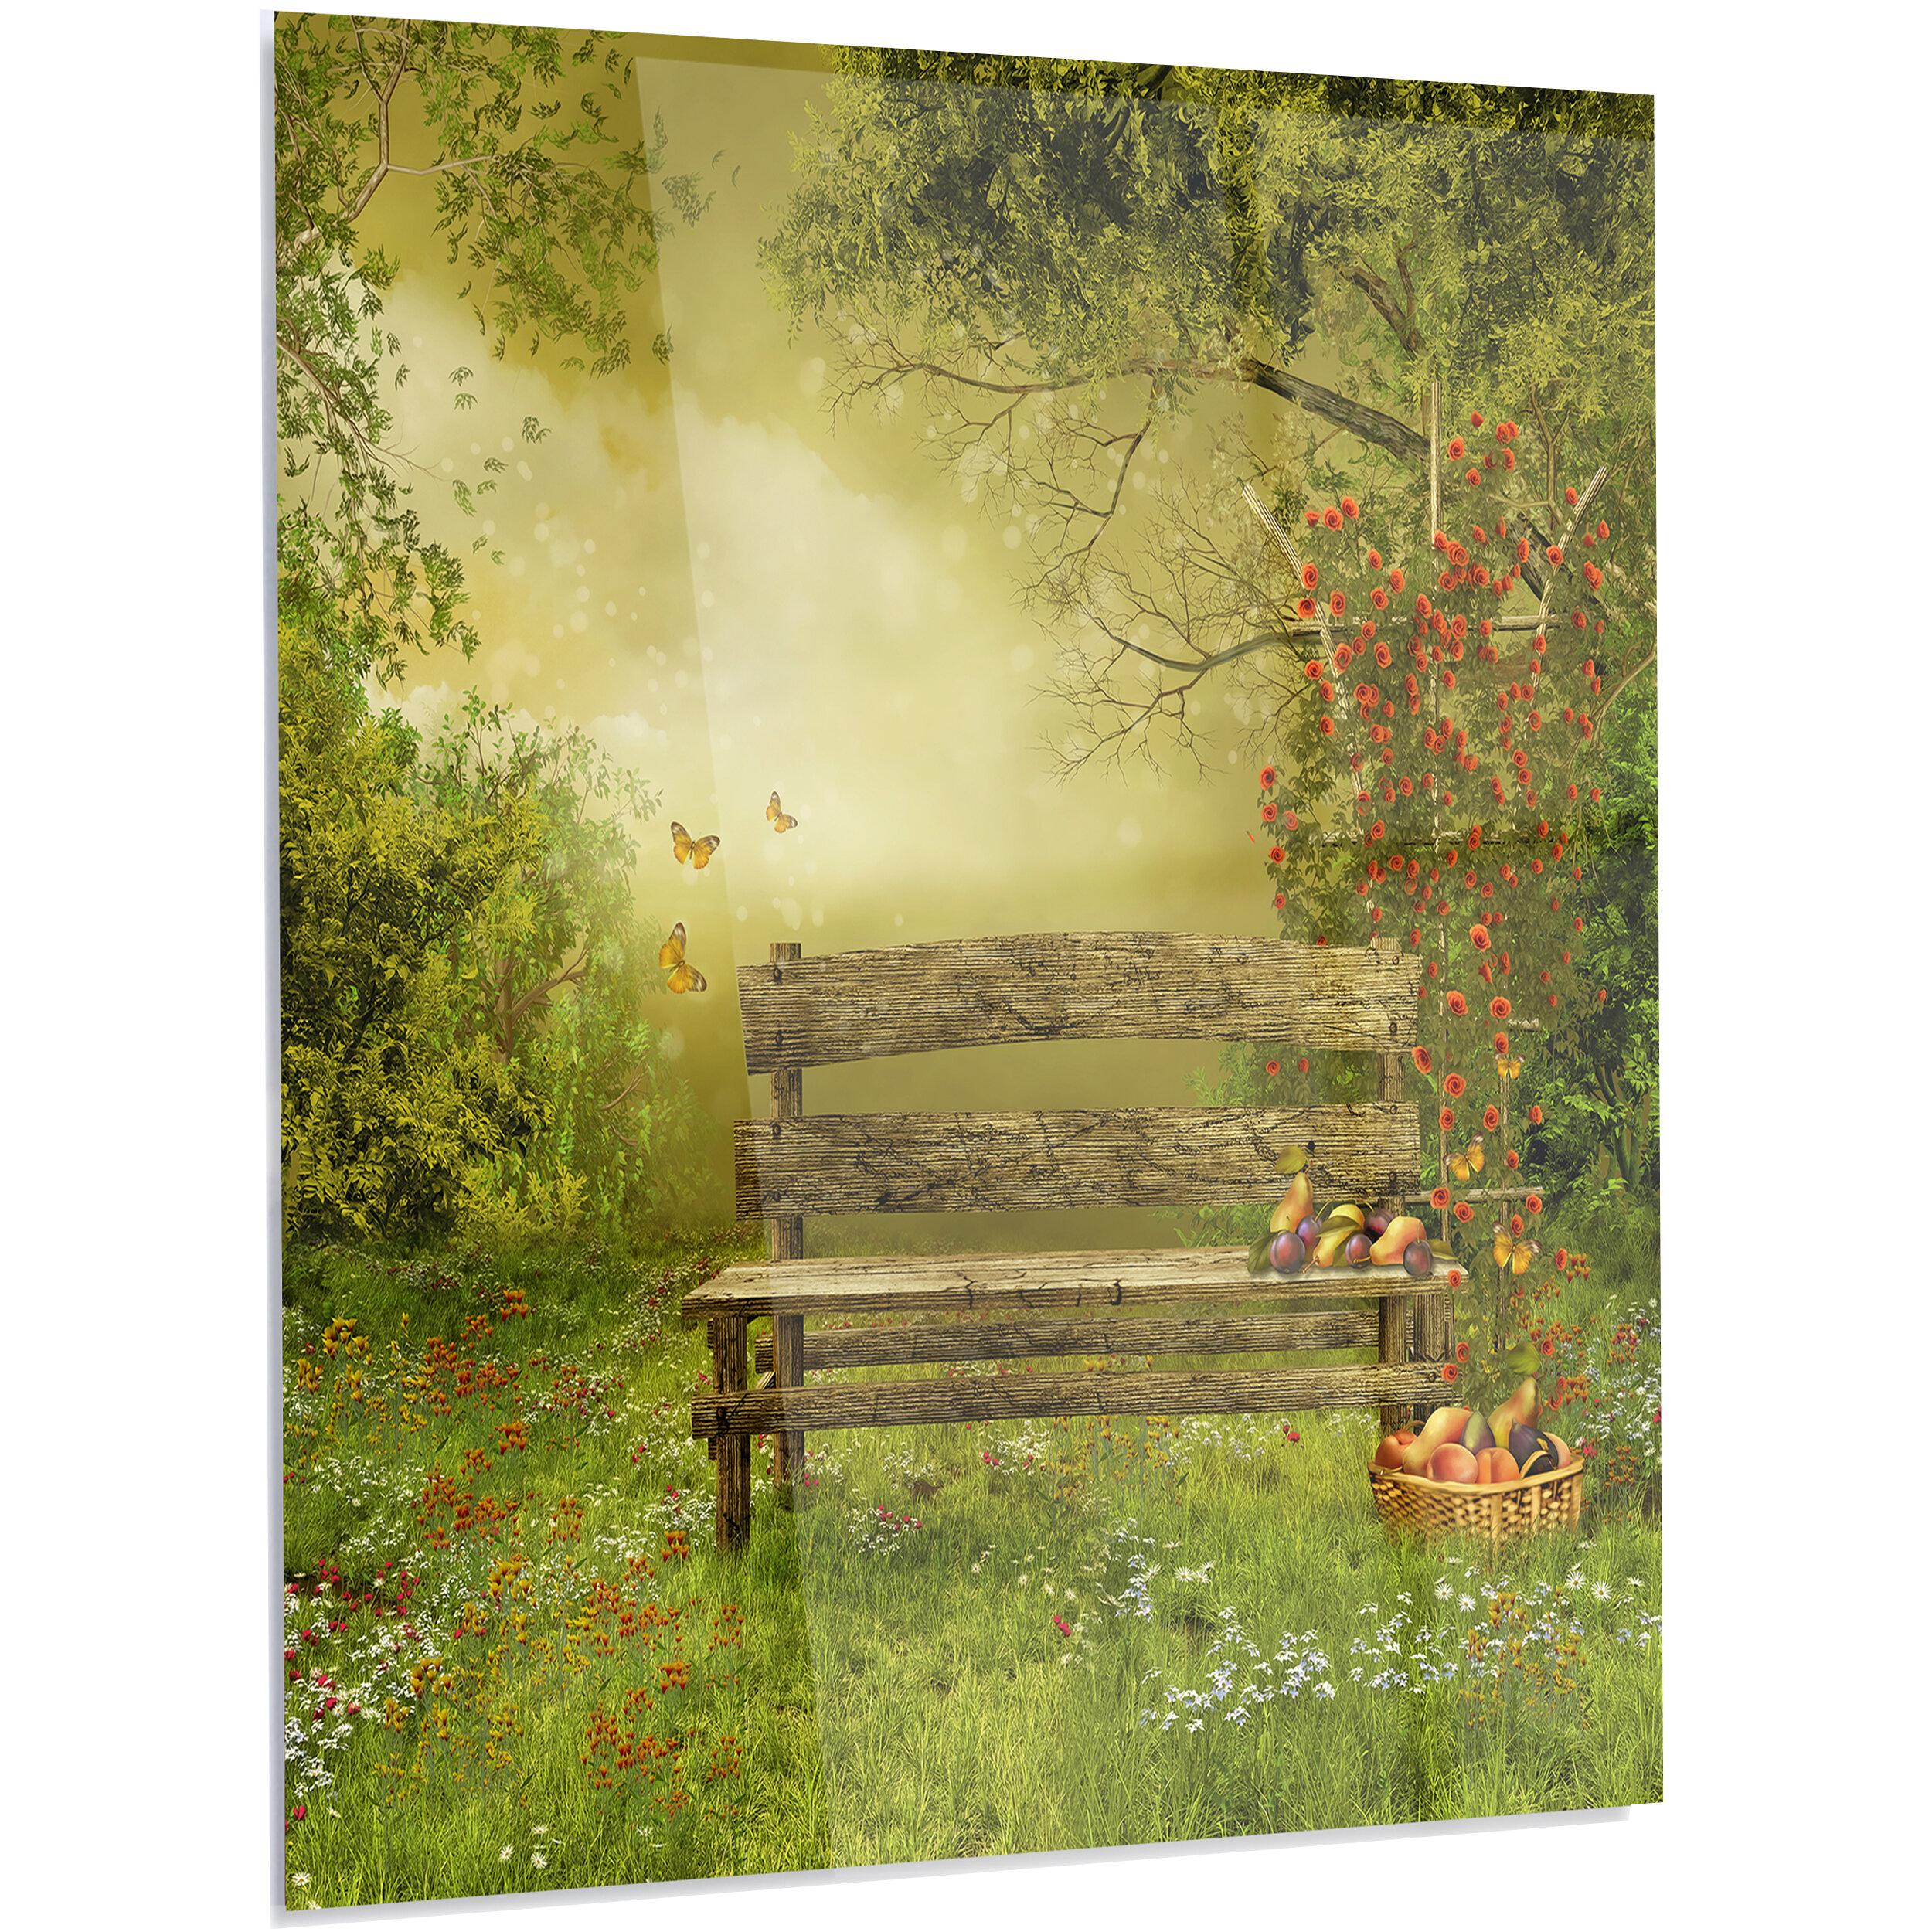 DesignArt \'Wooden Bench in Village Orchard\' Graphic Art on Metal ...